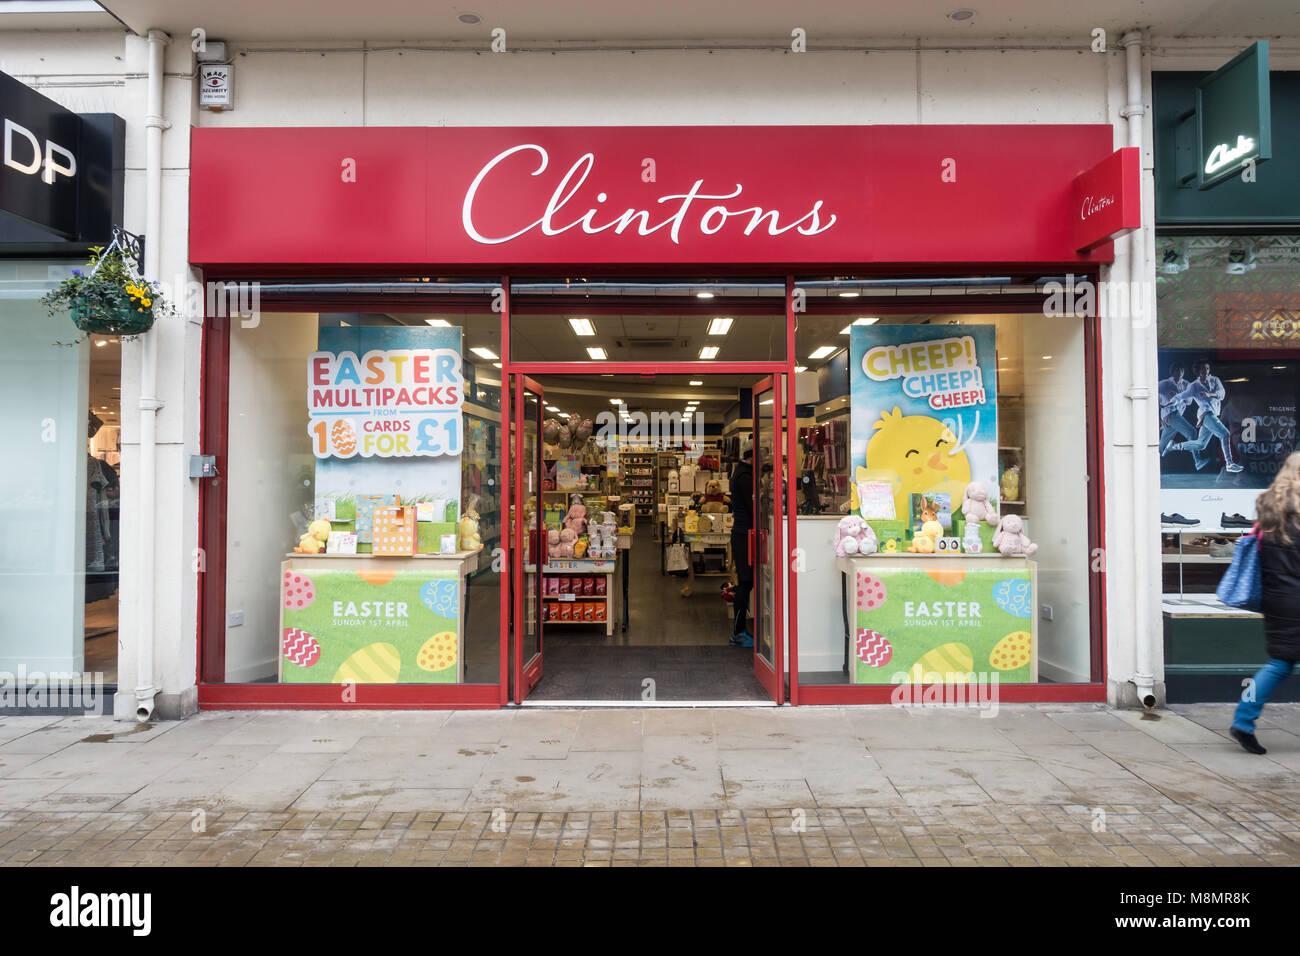 Greetings Card Shop Stock Photos Greetings Card Shop Stock Images